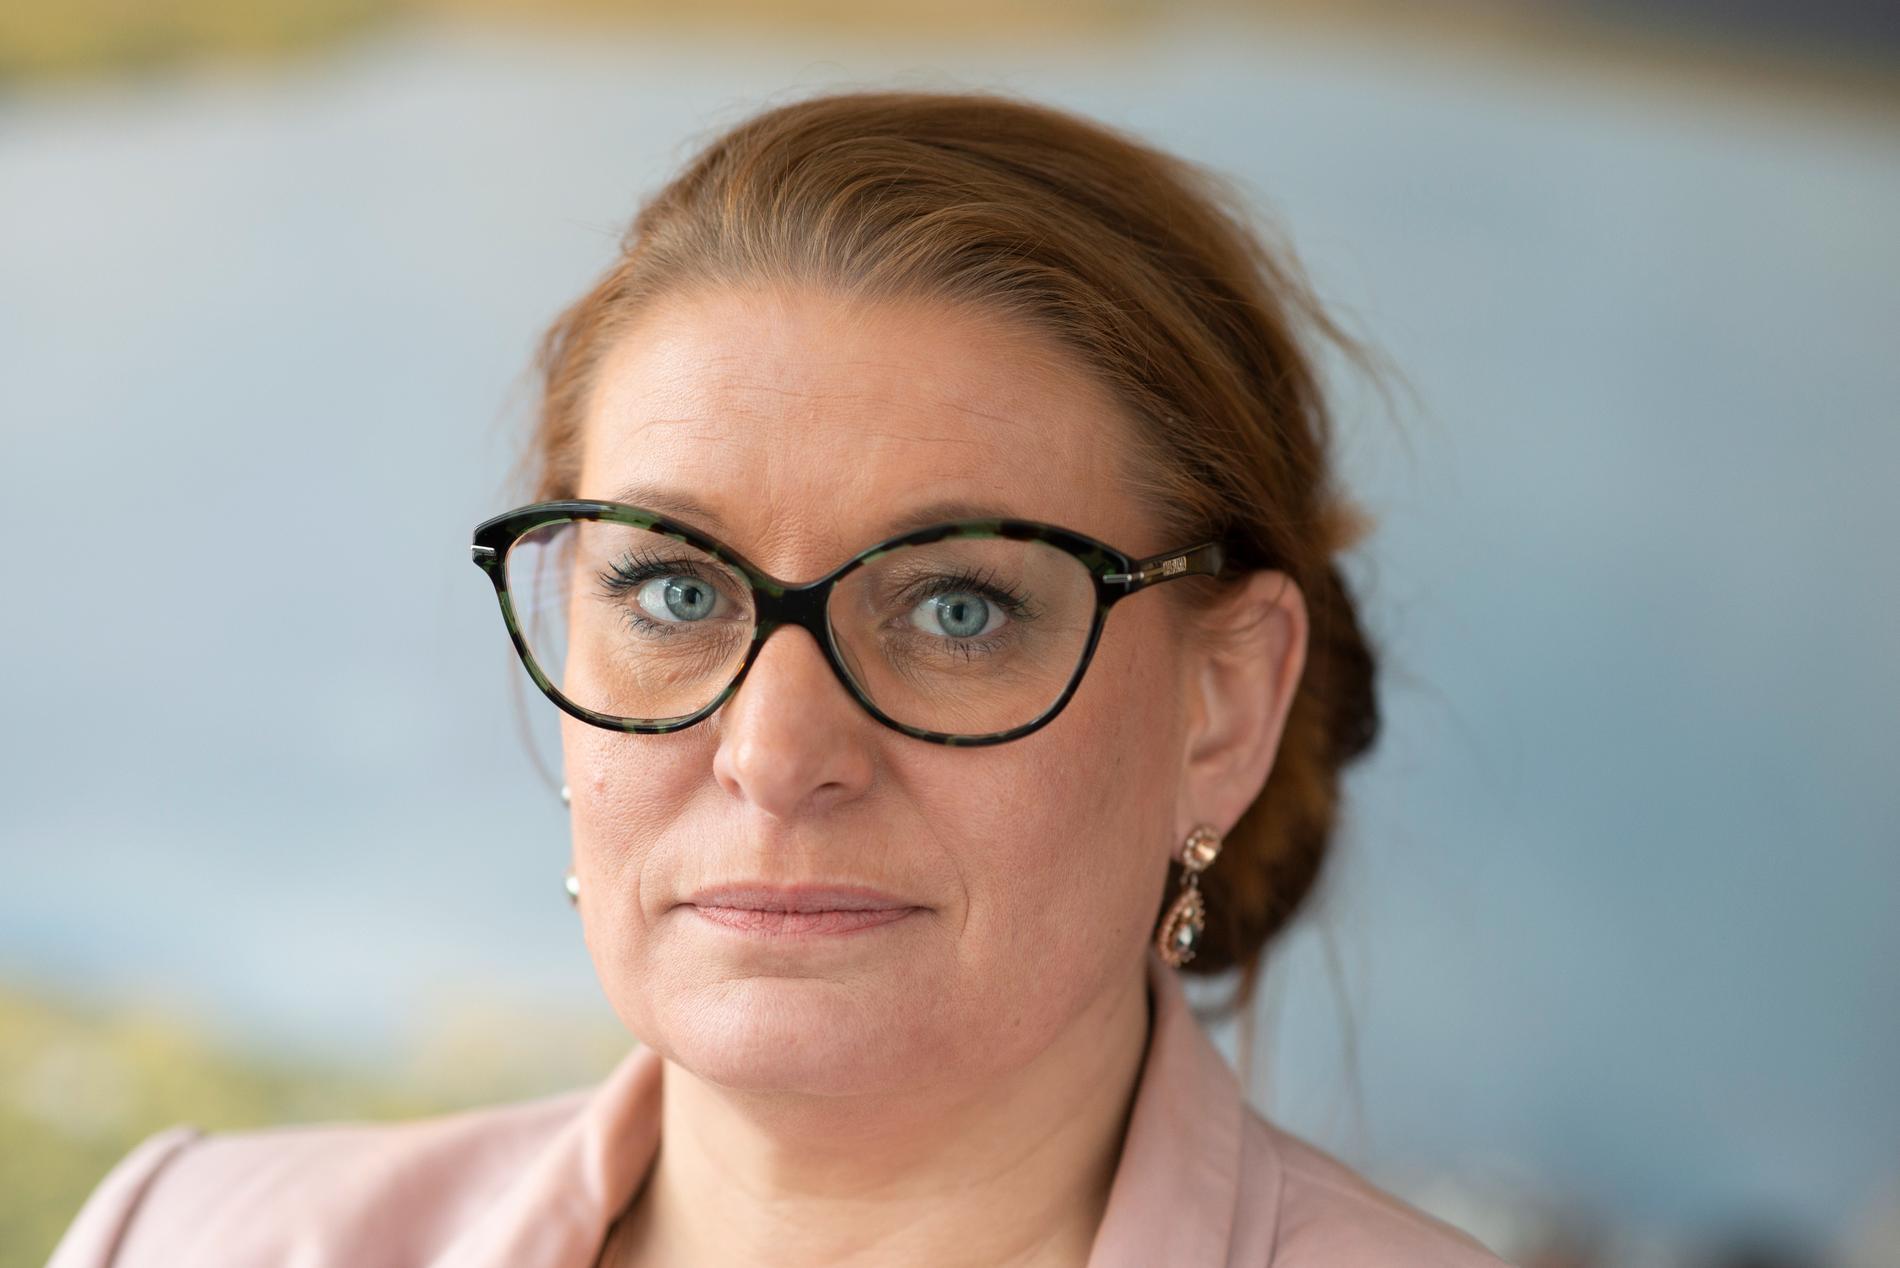 Linda Frohm